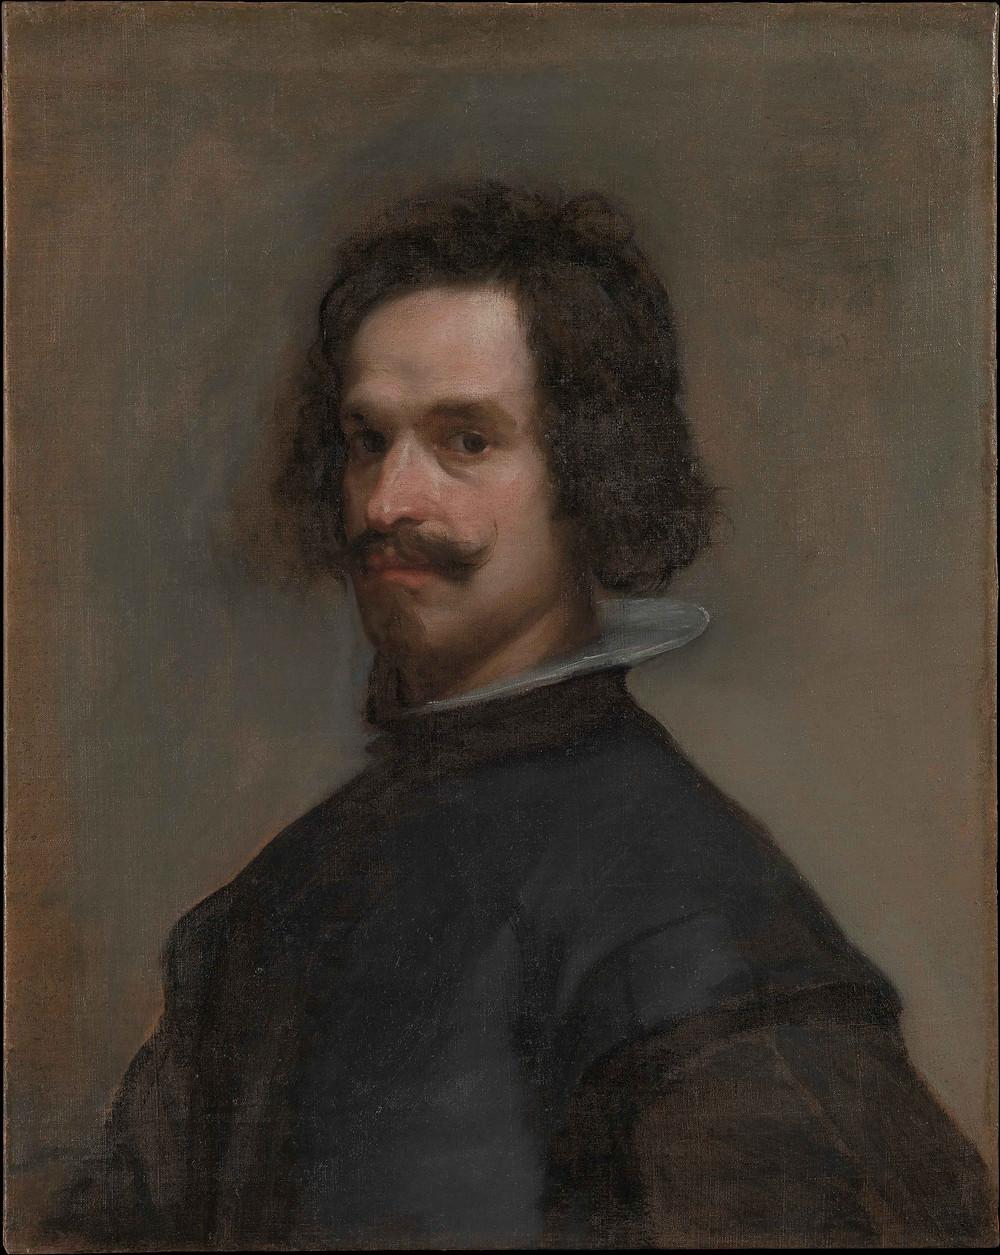 Oil on canvas, 68.6 x 55.2 cm